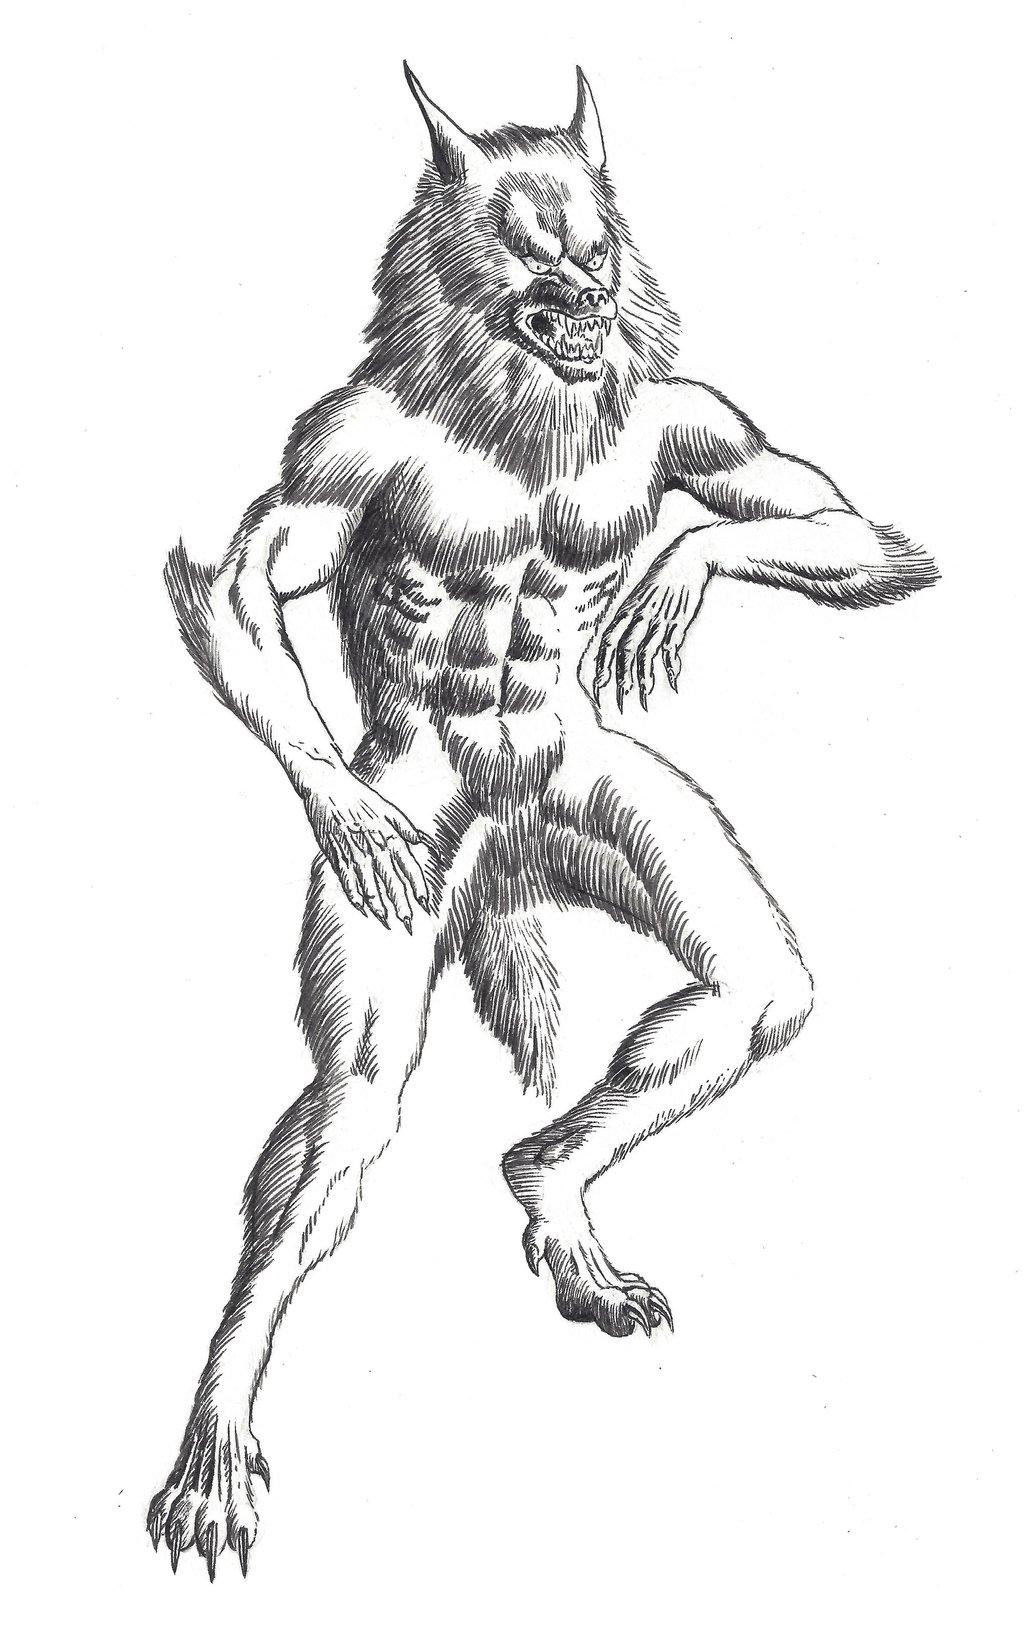 1024x1630 Werewolf (Brush And Ink) By Crazyeric24